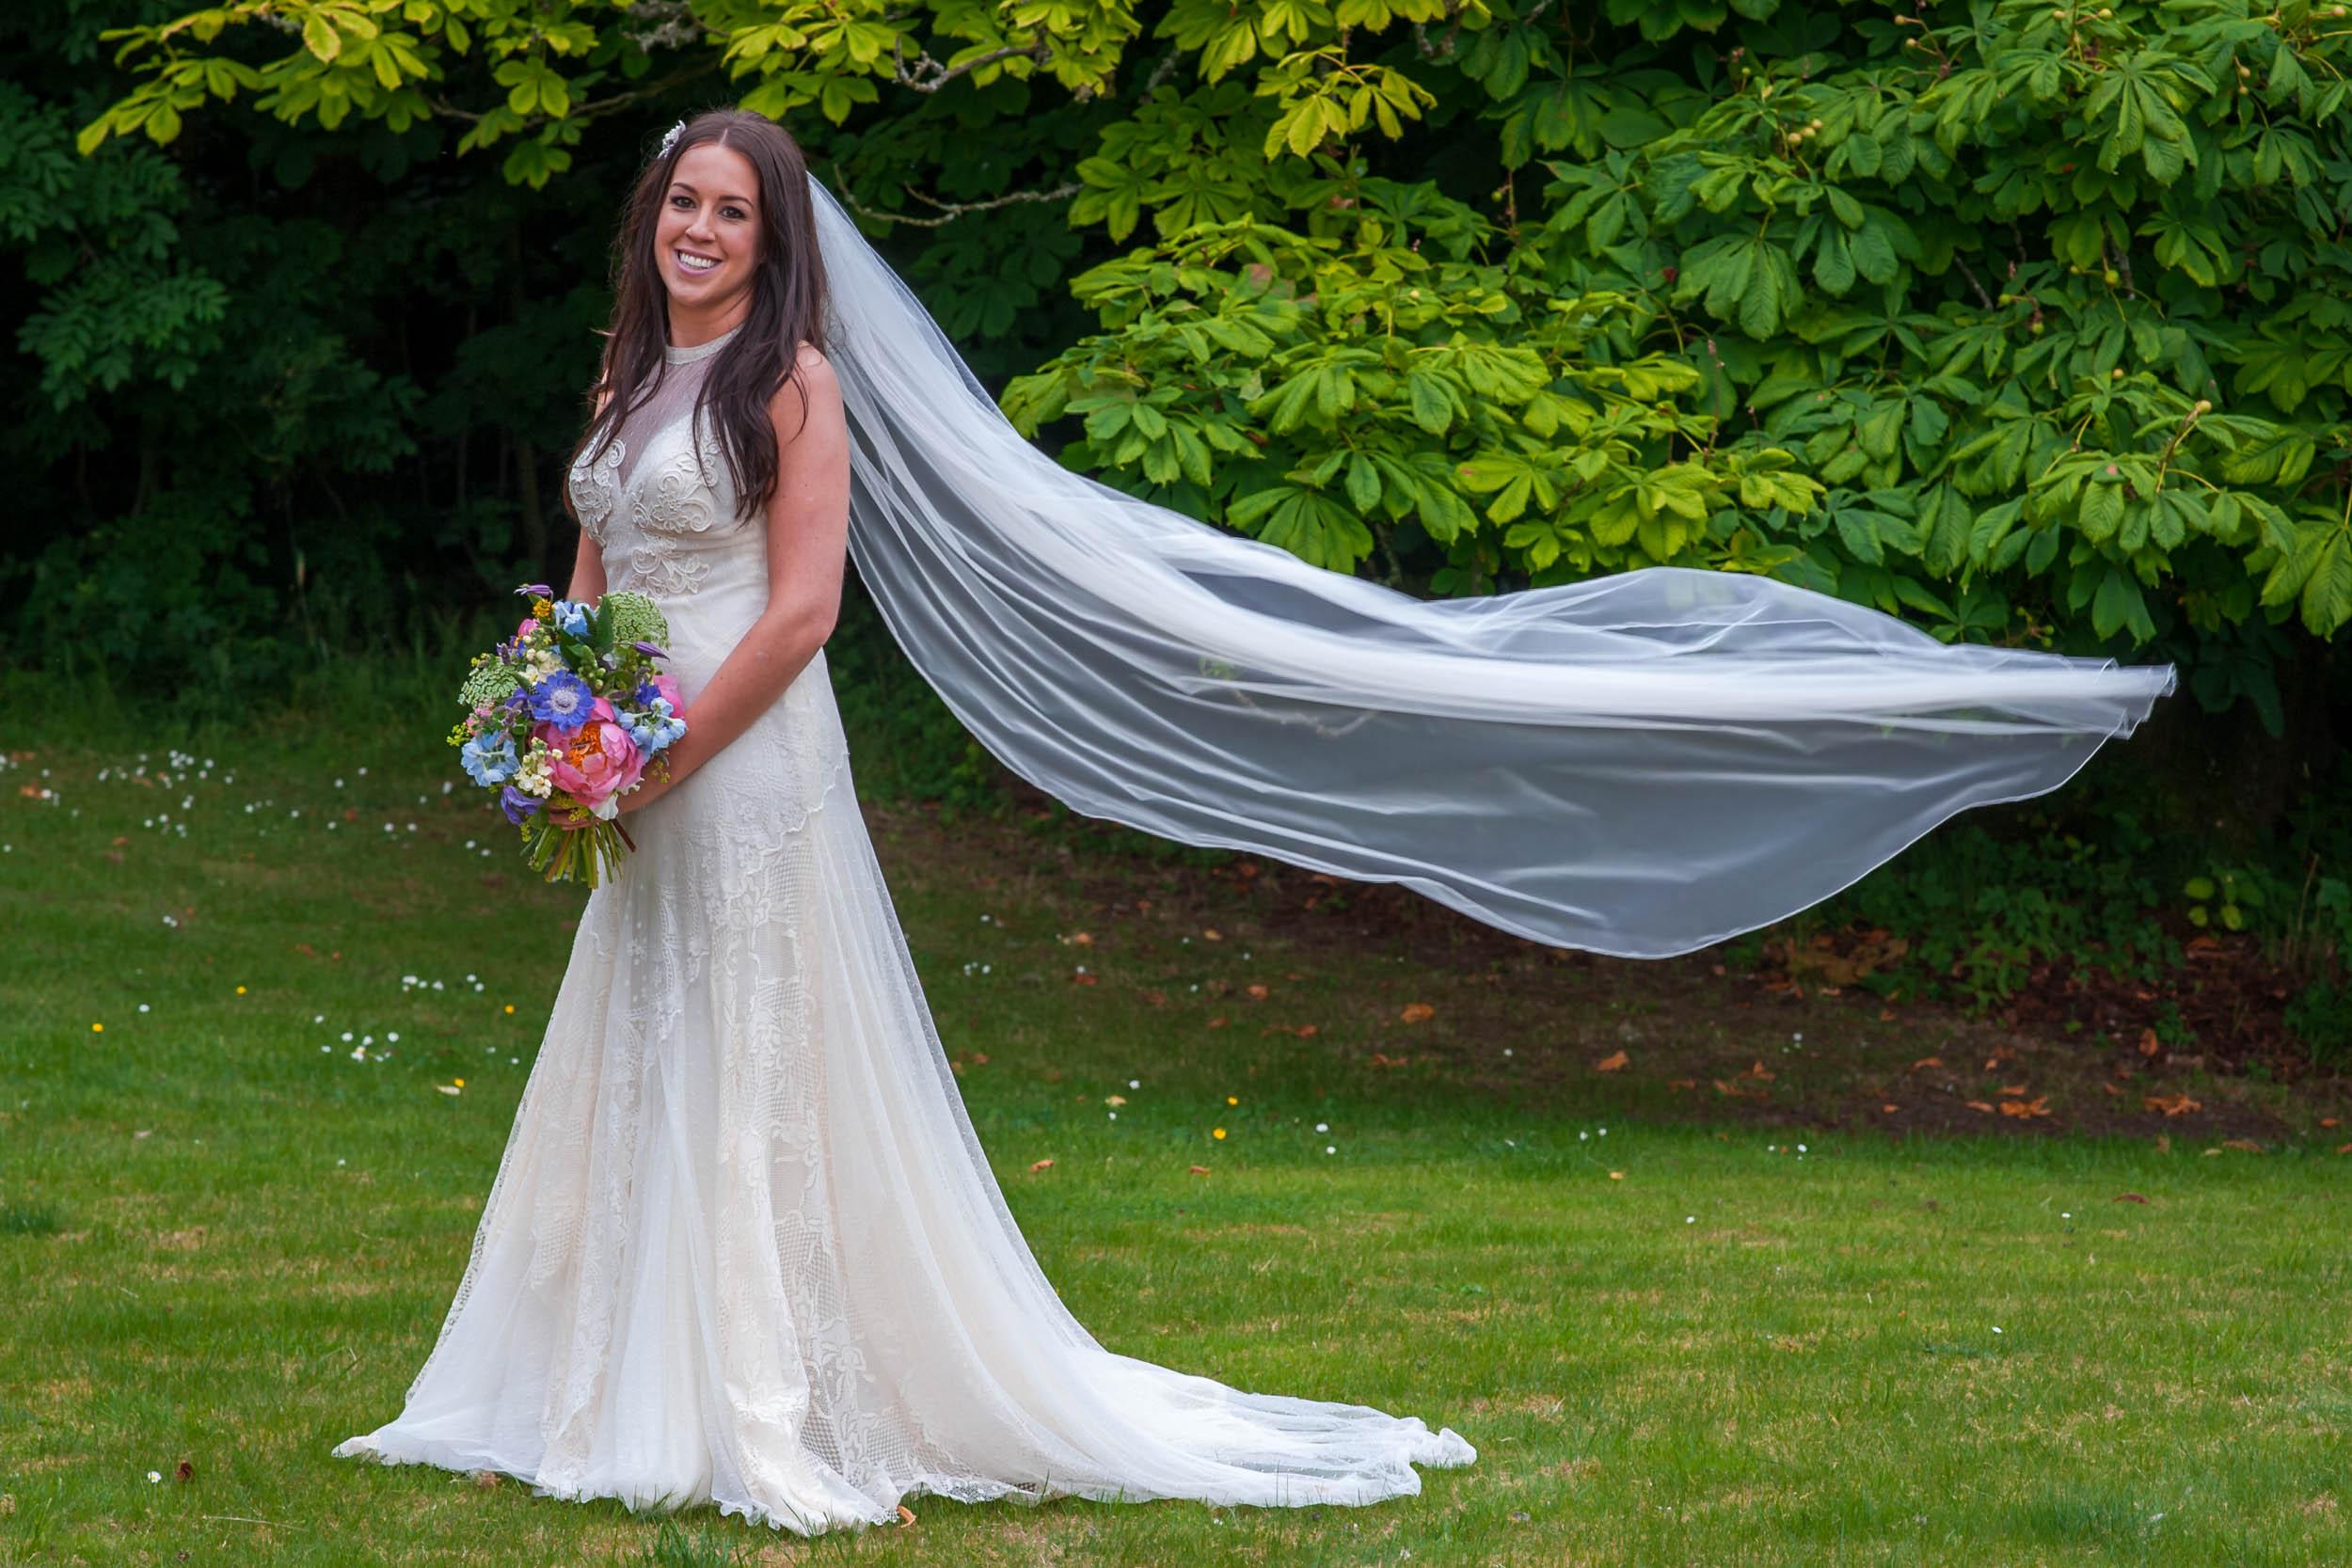 Bride-0180.jpg